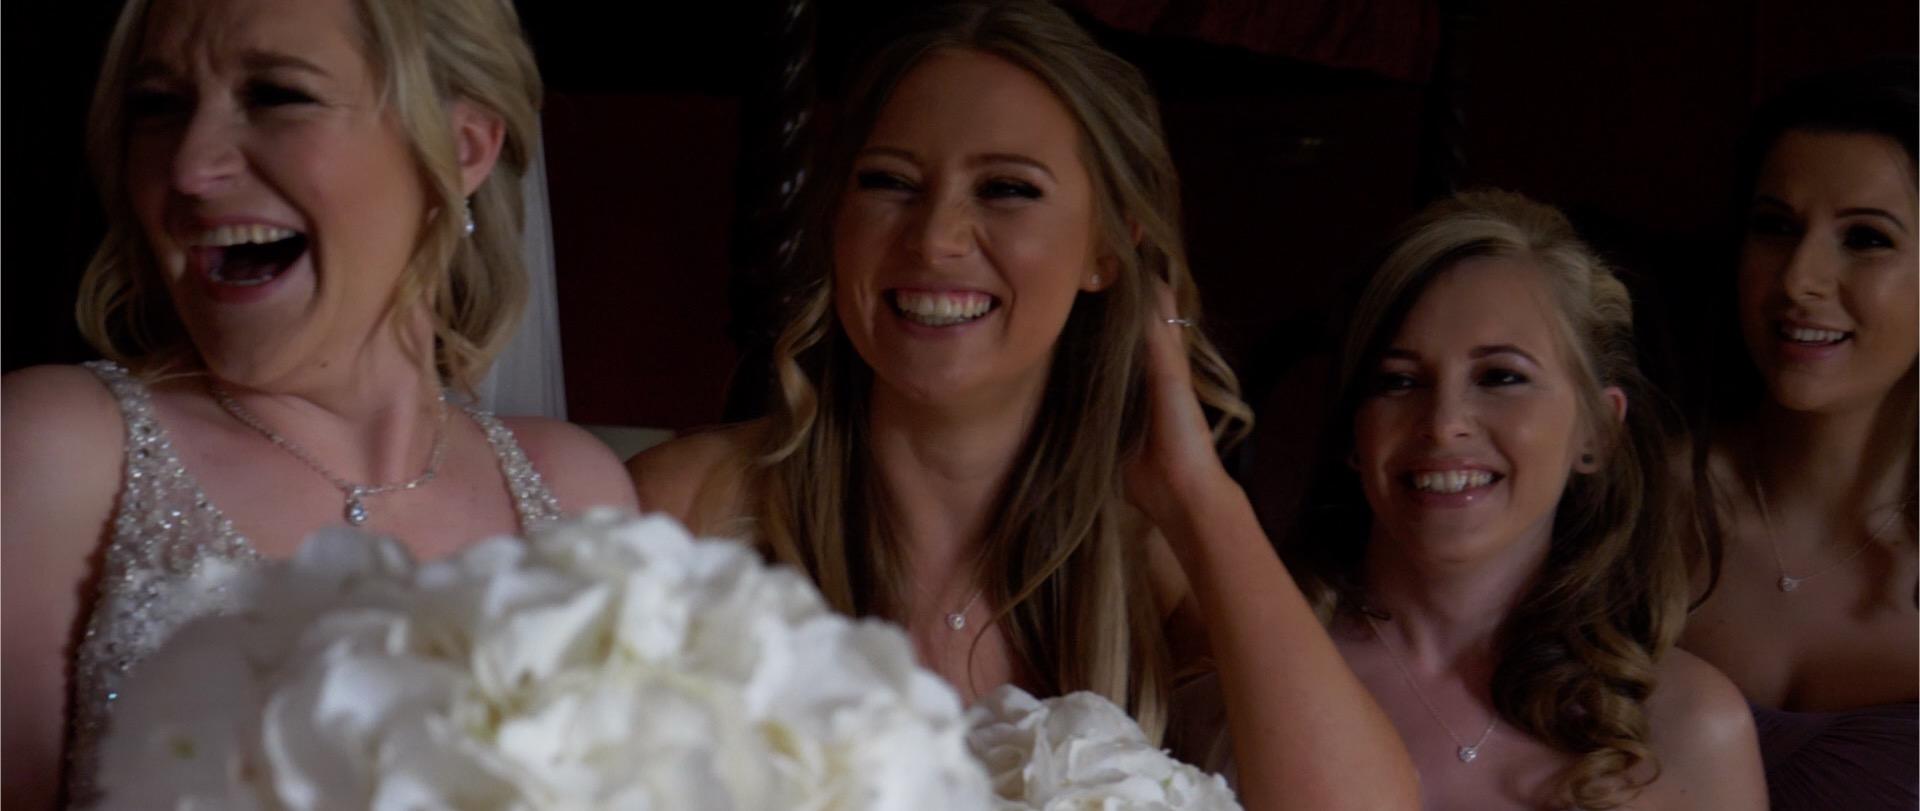 Bridal Preparation smiles quendon hall video.jpg